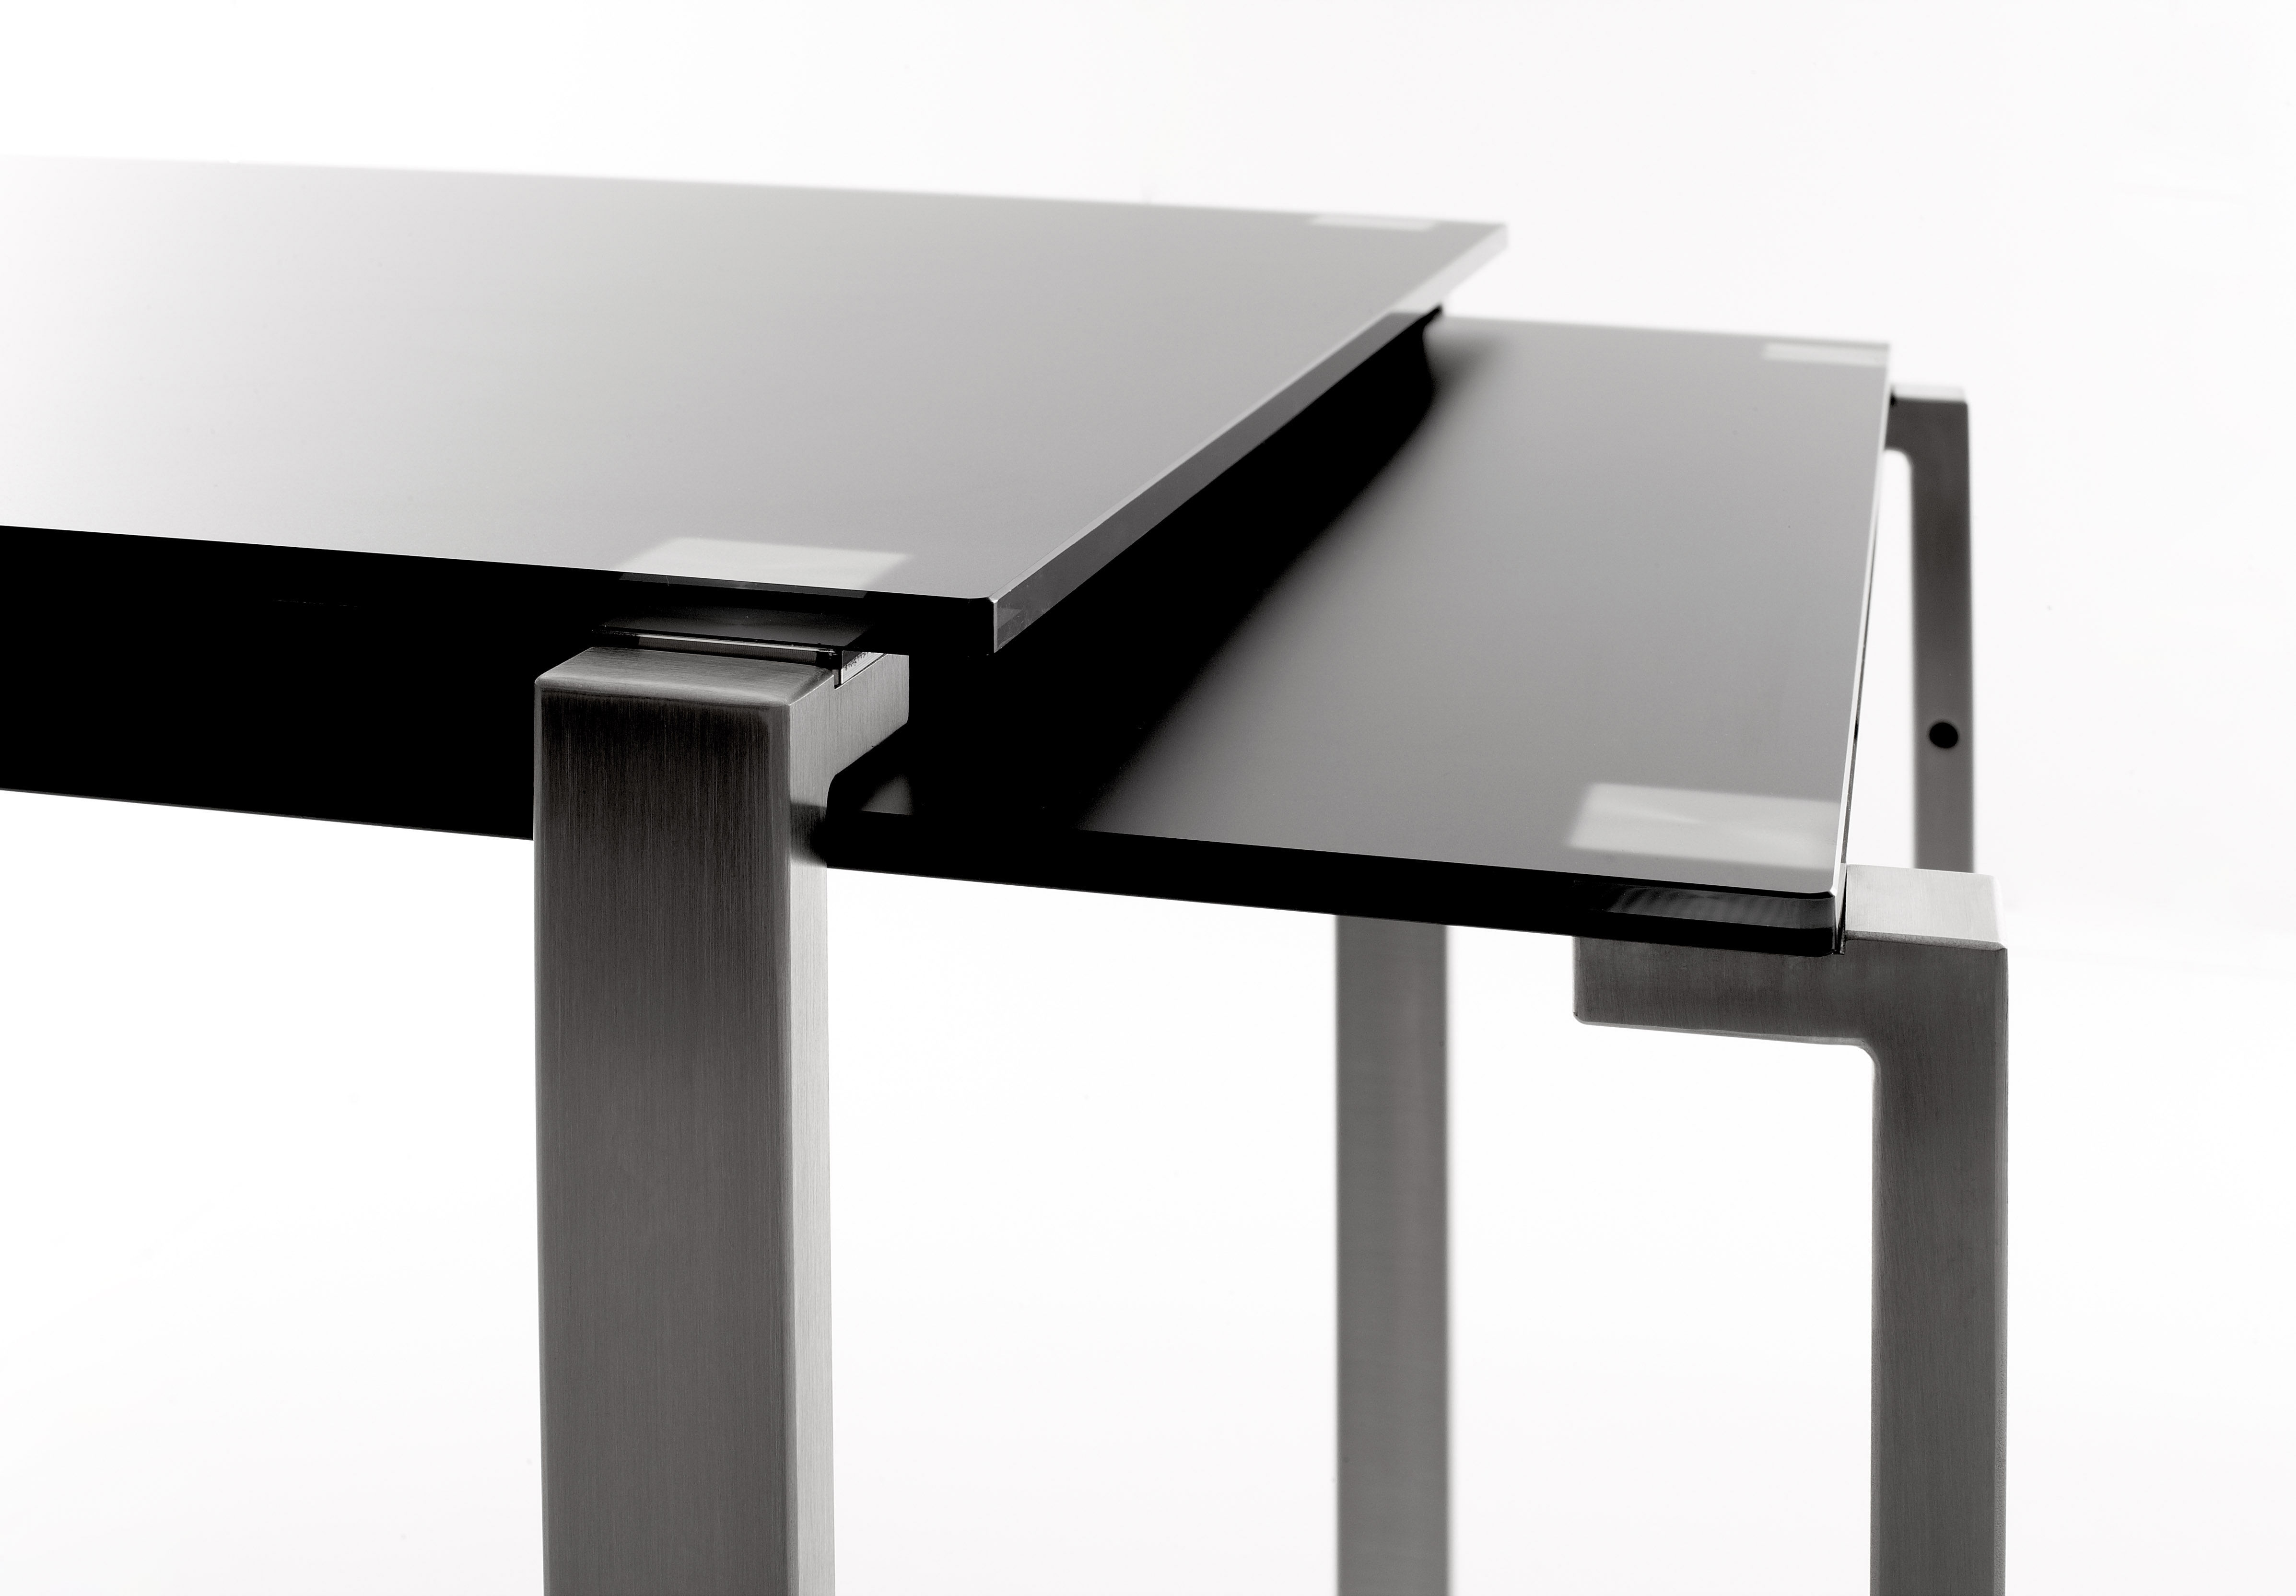 1 2 tavolo con prolunga set di 2 tavoli impilabili for Prolunga tavolo